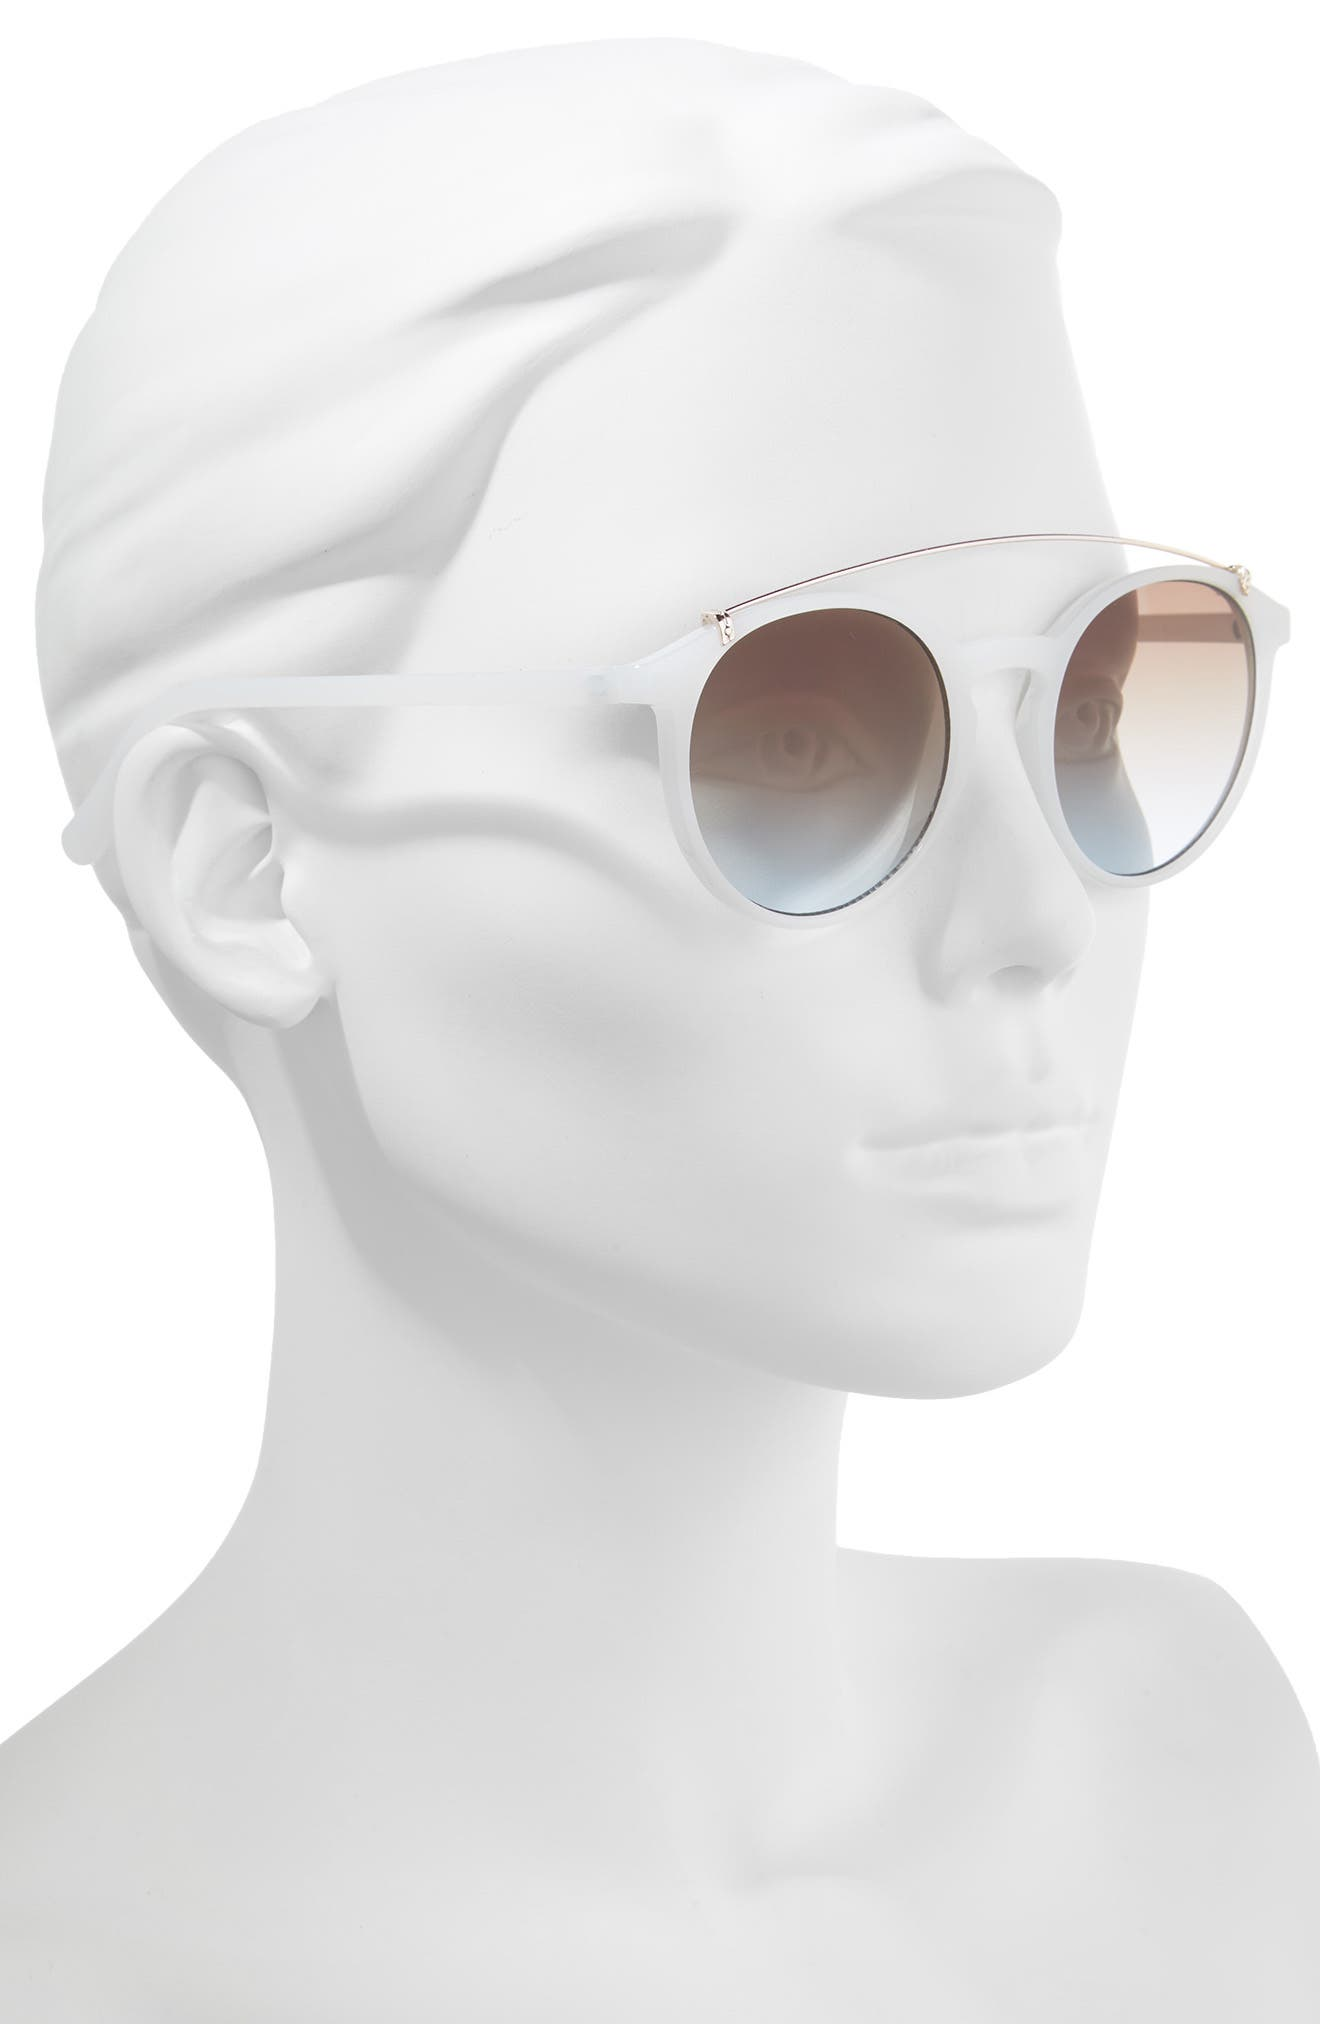 Round Aviator Sunglasses,                             Alternate thumbnail 2, color,                             Milky White/ Gold